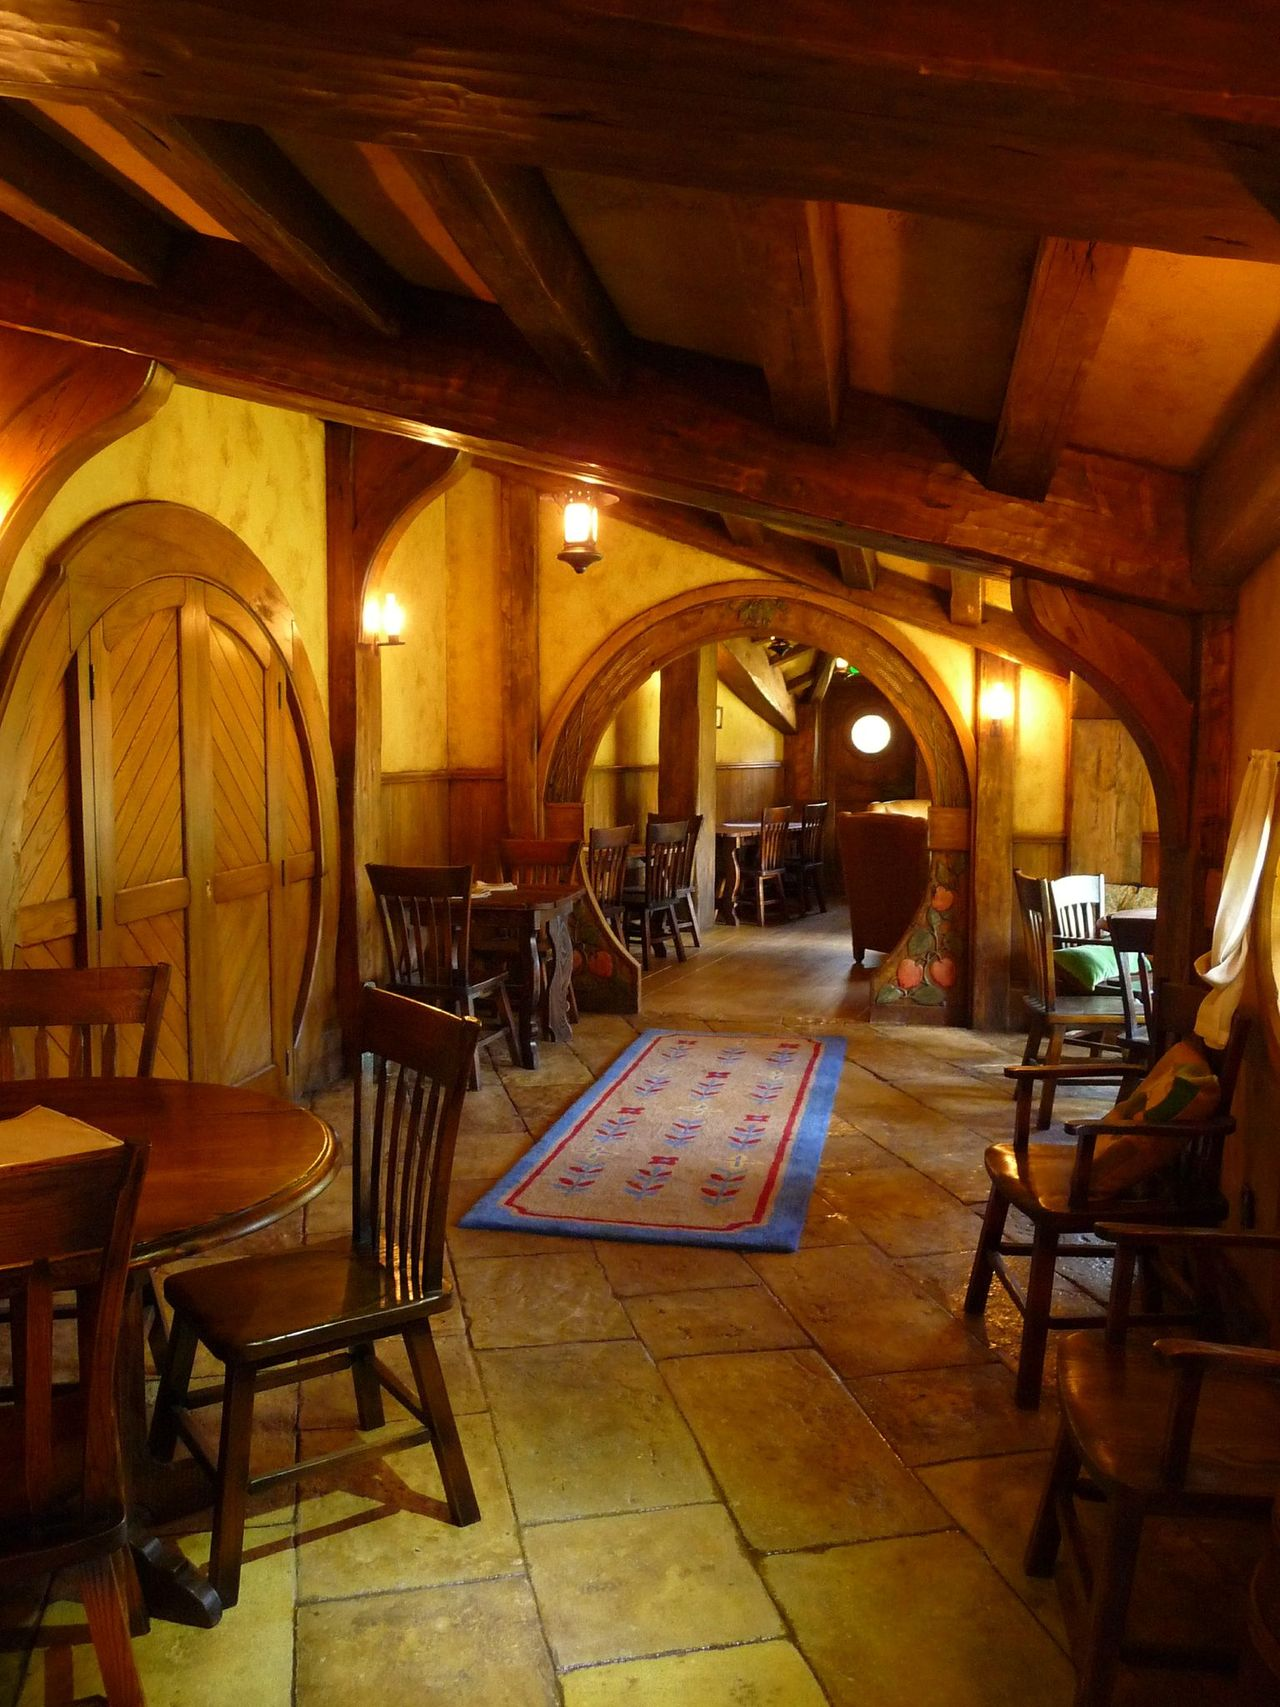 hobbit house pictures the hobbit set photos. Black Bedroom Furniture Sets. Home Design Ideas